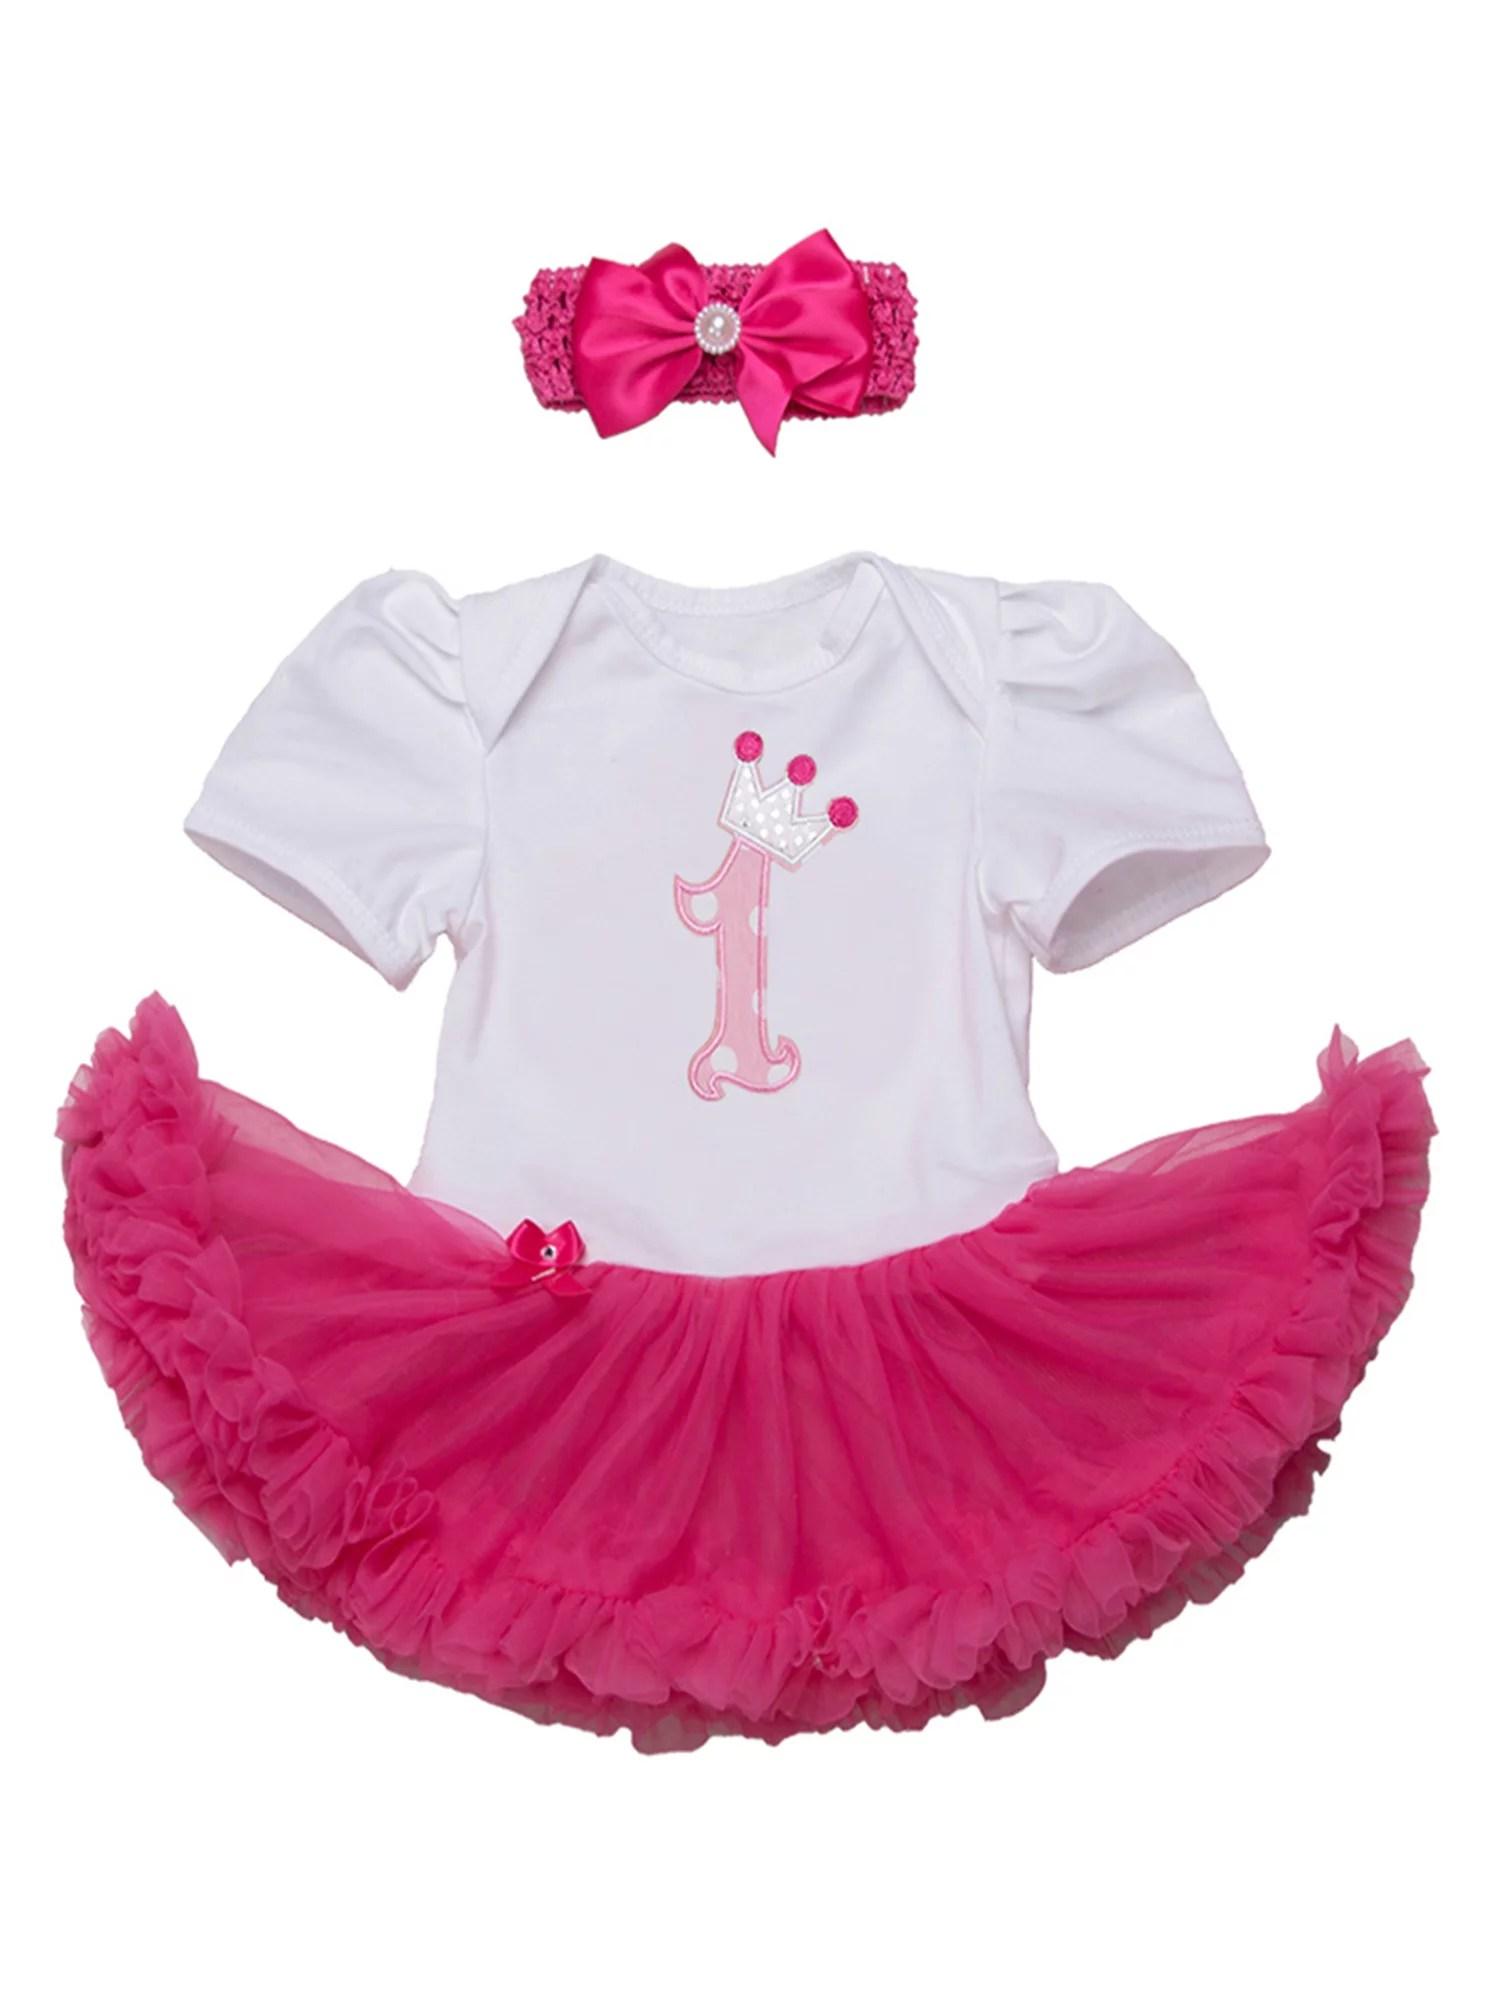 Stylesilove Stylesilove Cute Character Baby Girl Holiday Birthday Party Tutu Dress Romper With Headband 2 Pcs Outfit Set 80 6 12 Months Fuchsia 1st Birthday Walmart Com Walmart Com